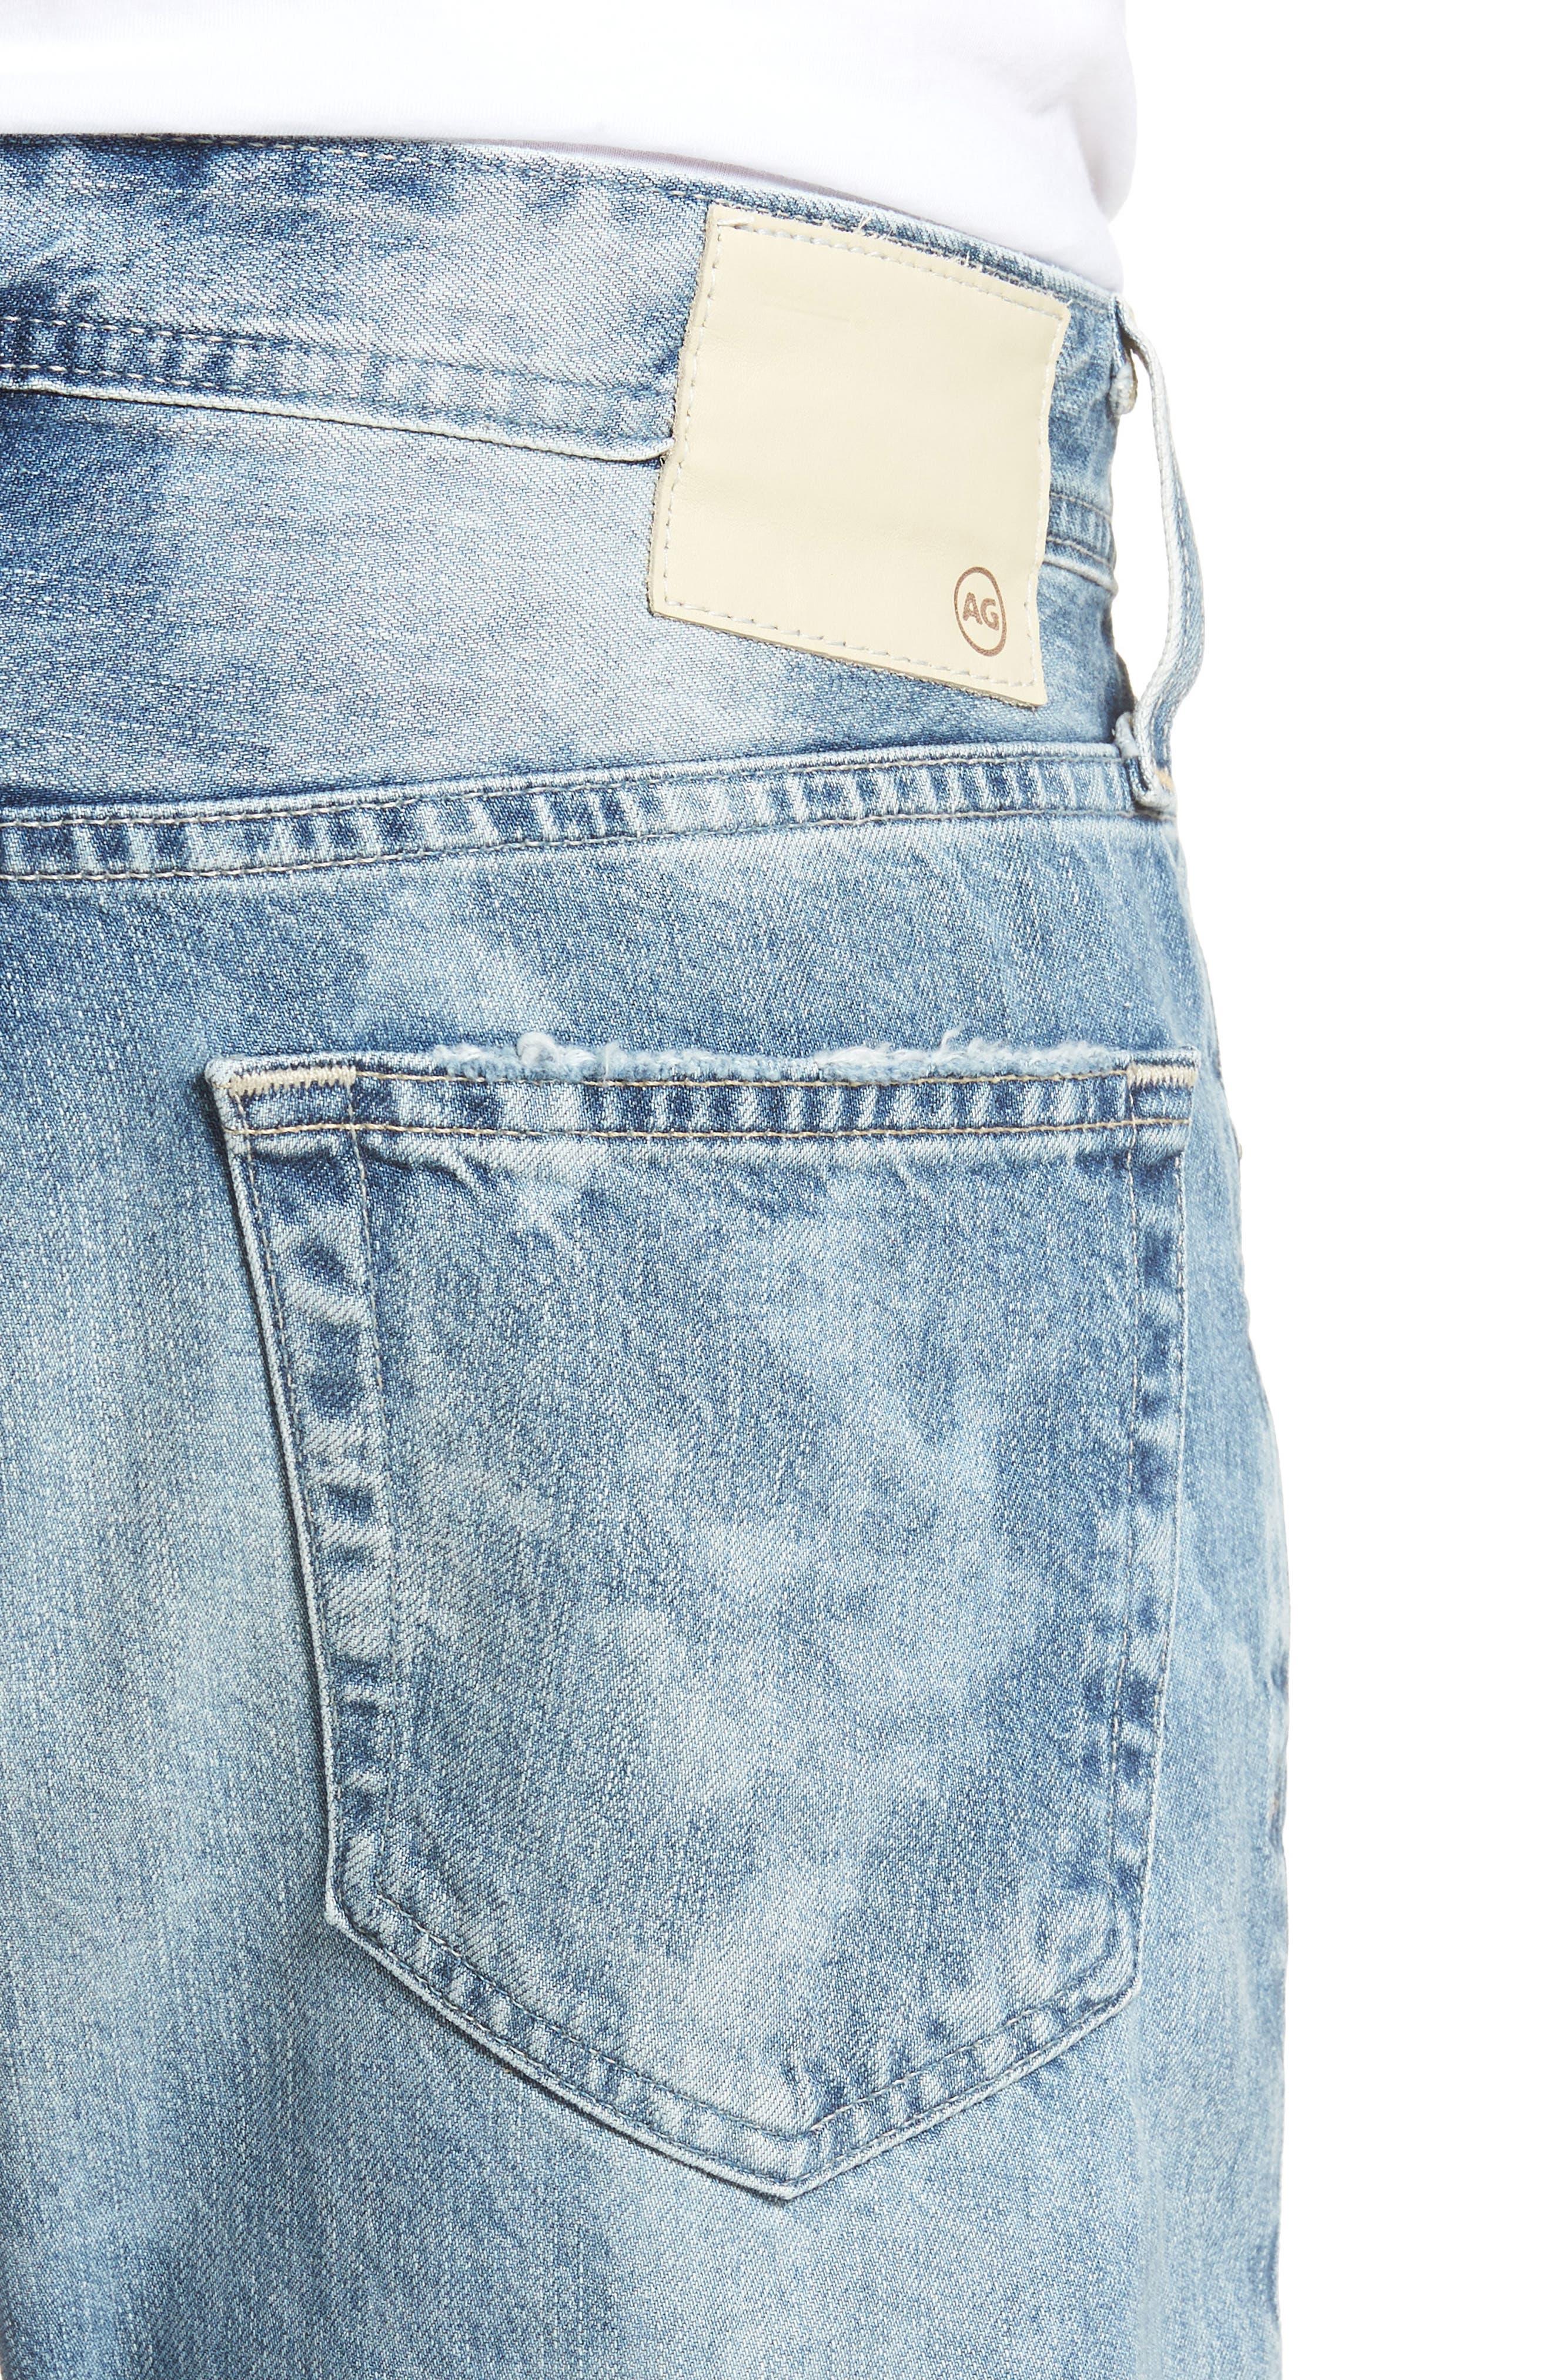 Tellis Slim Fit Jeans,                             Alternate thumbnail 4, color,                             461